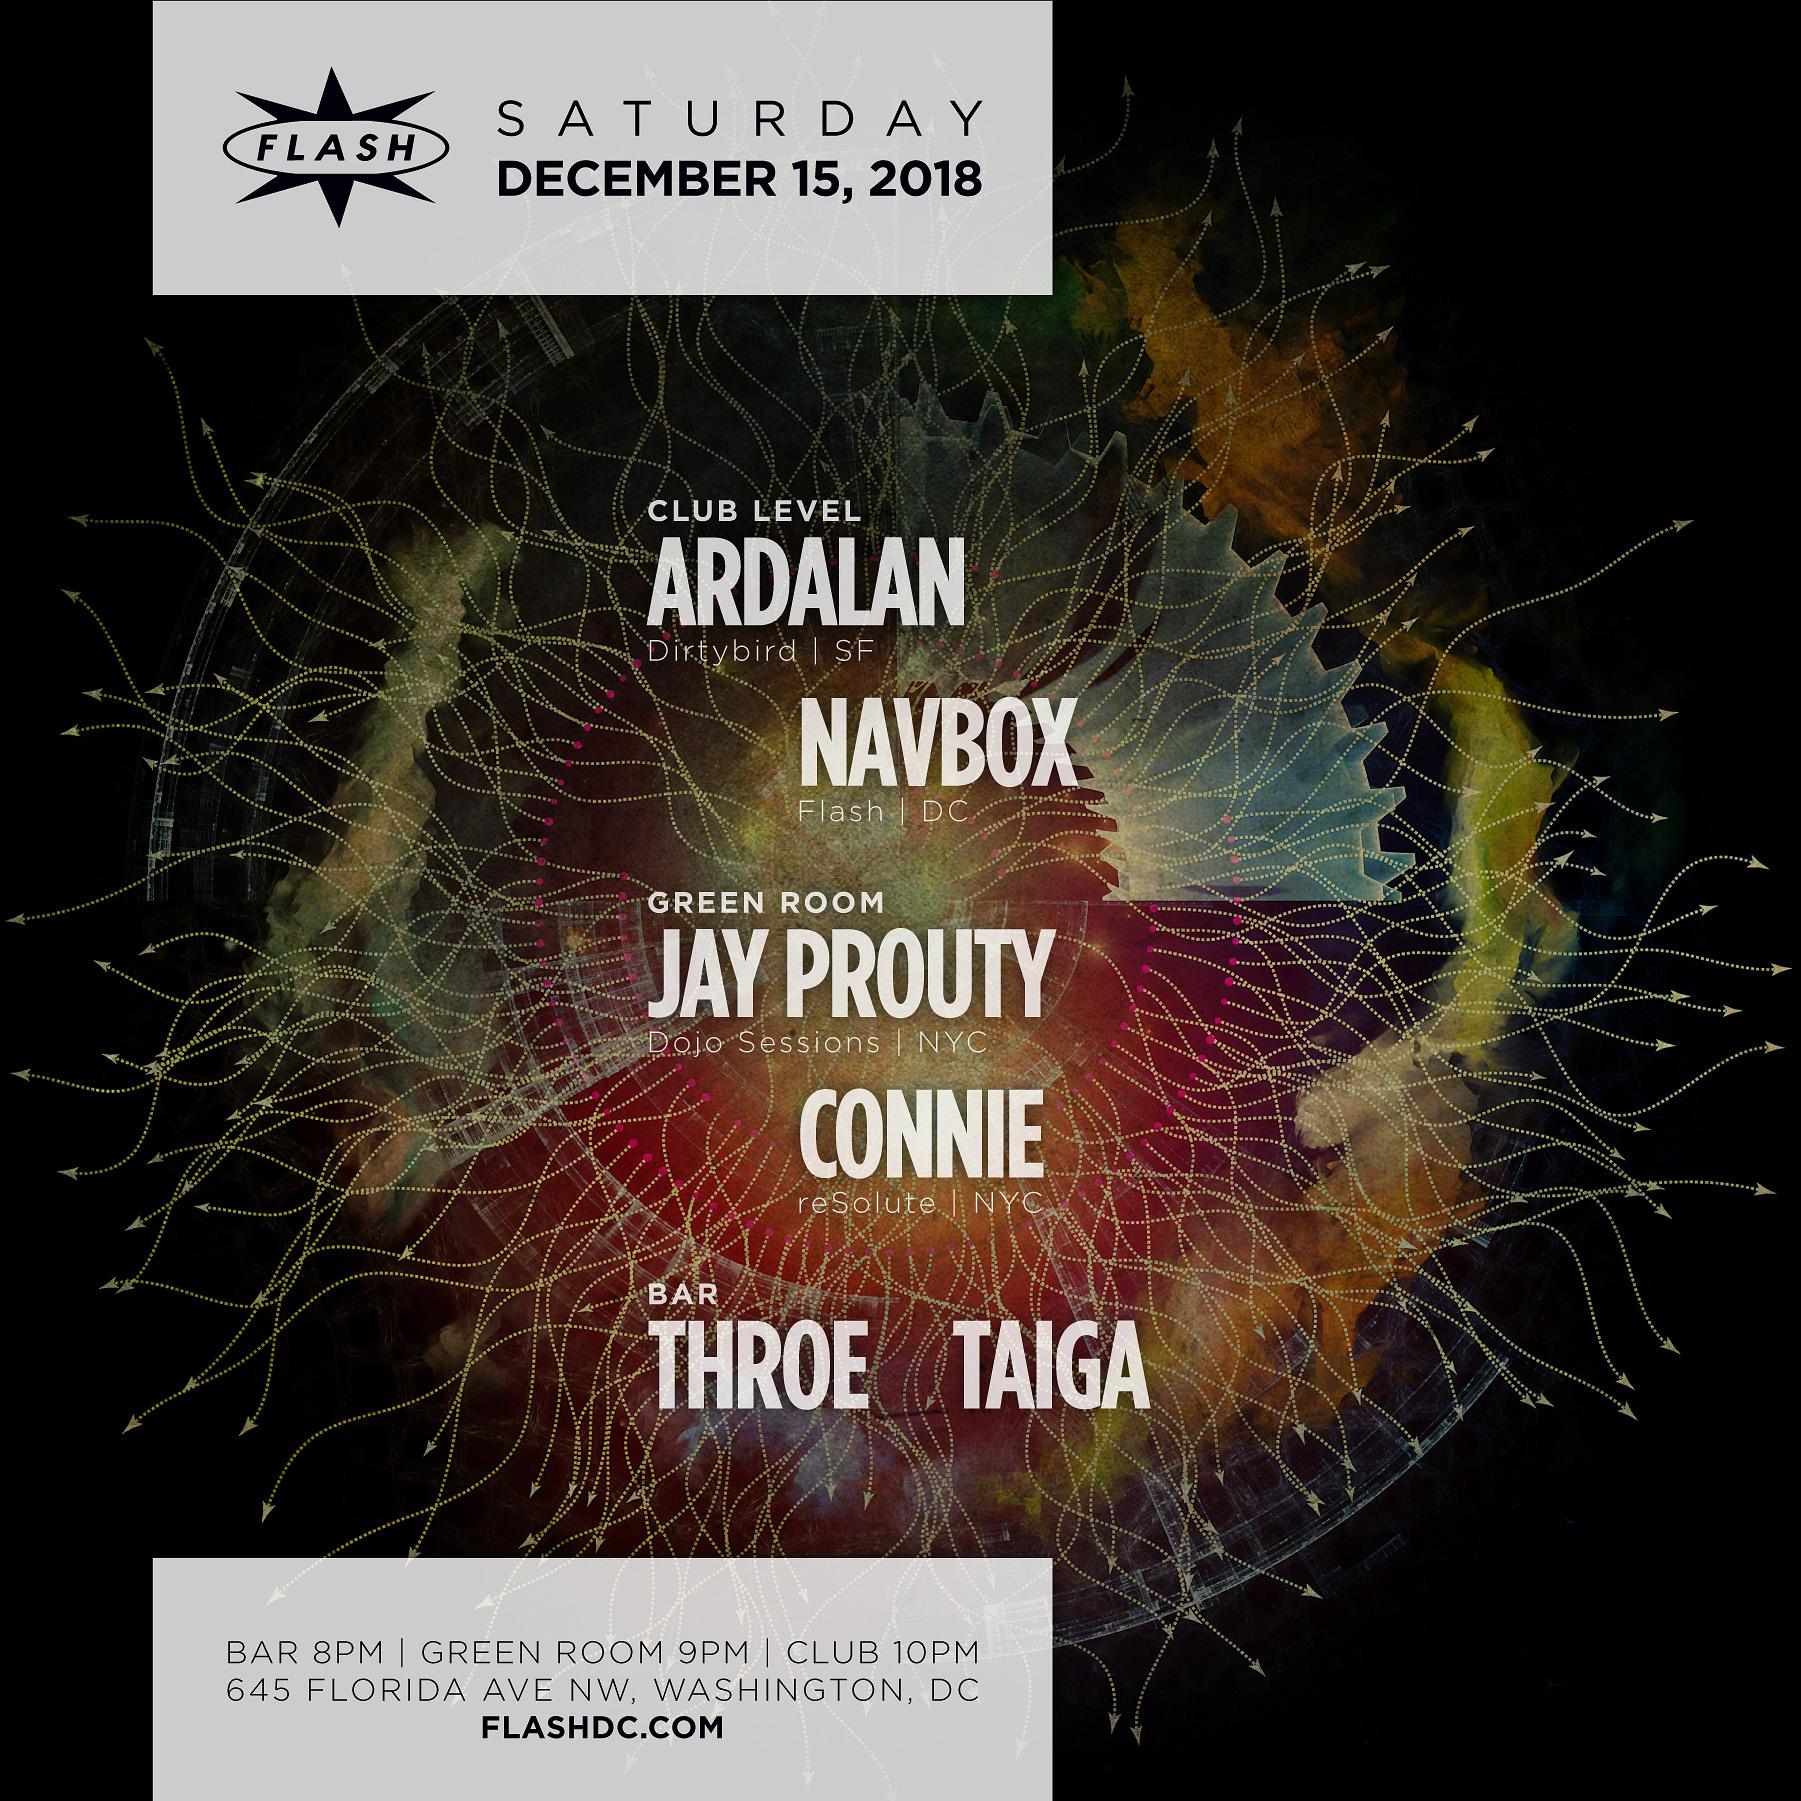 Ardalan - Navbox - Jay Prouty - Connie event thumbnail